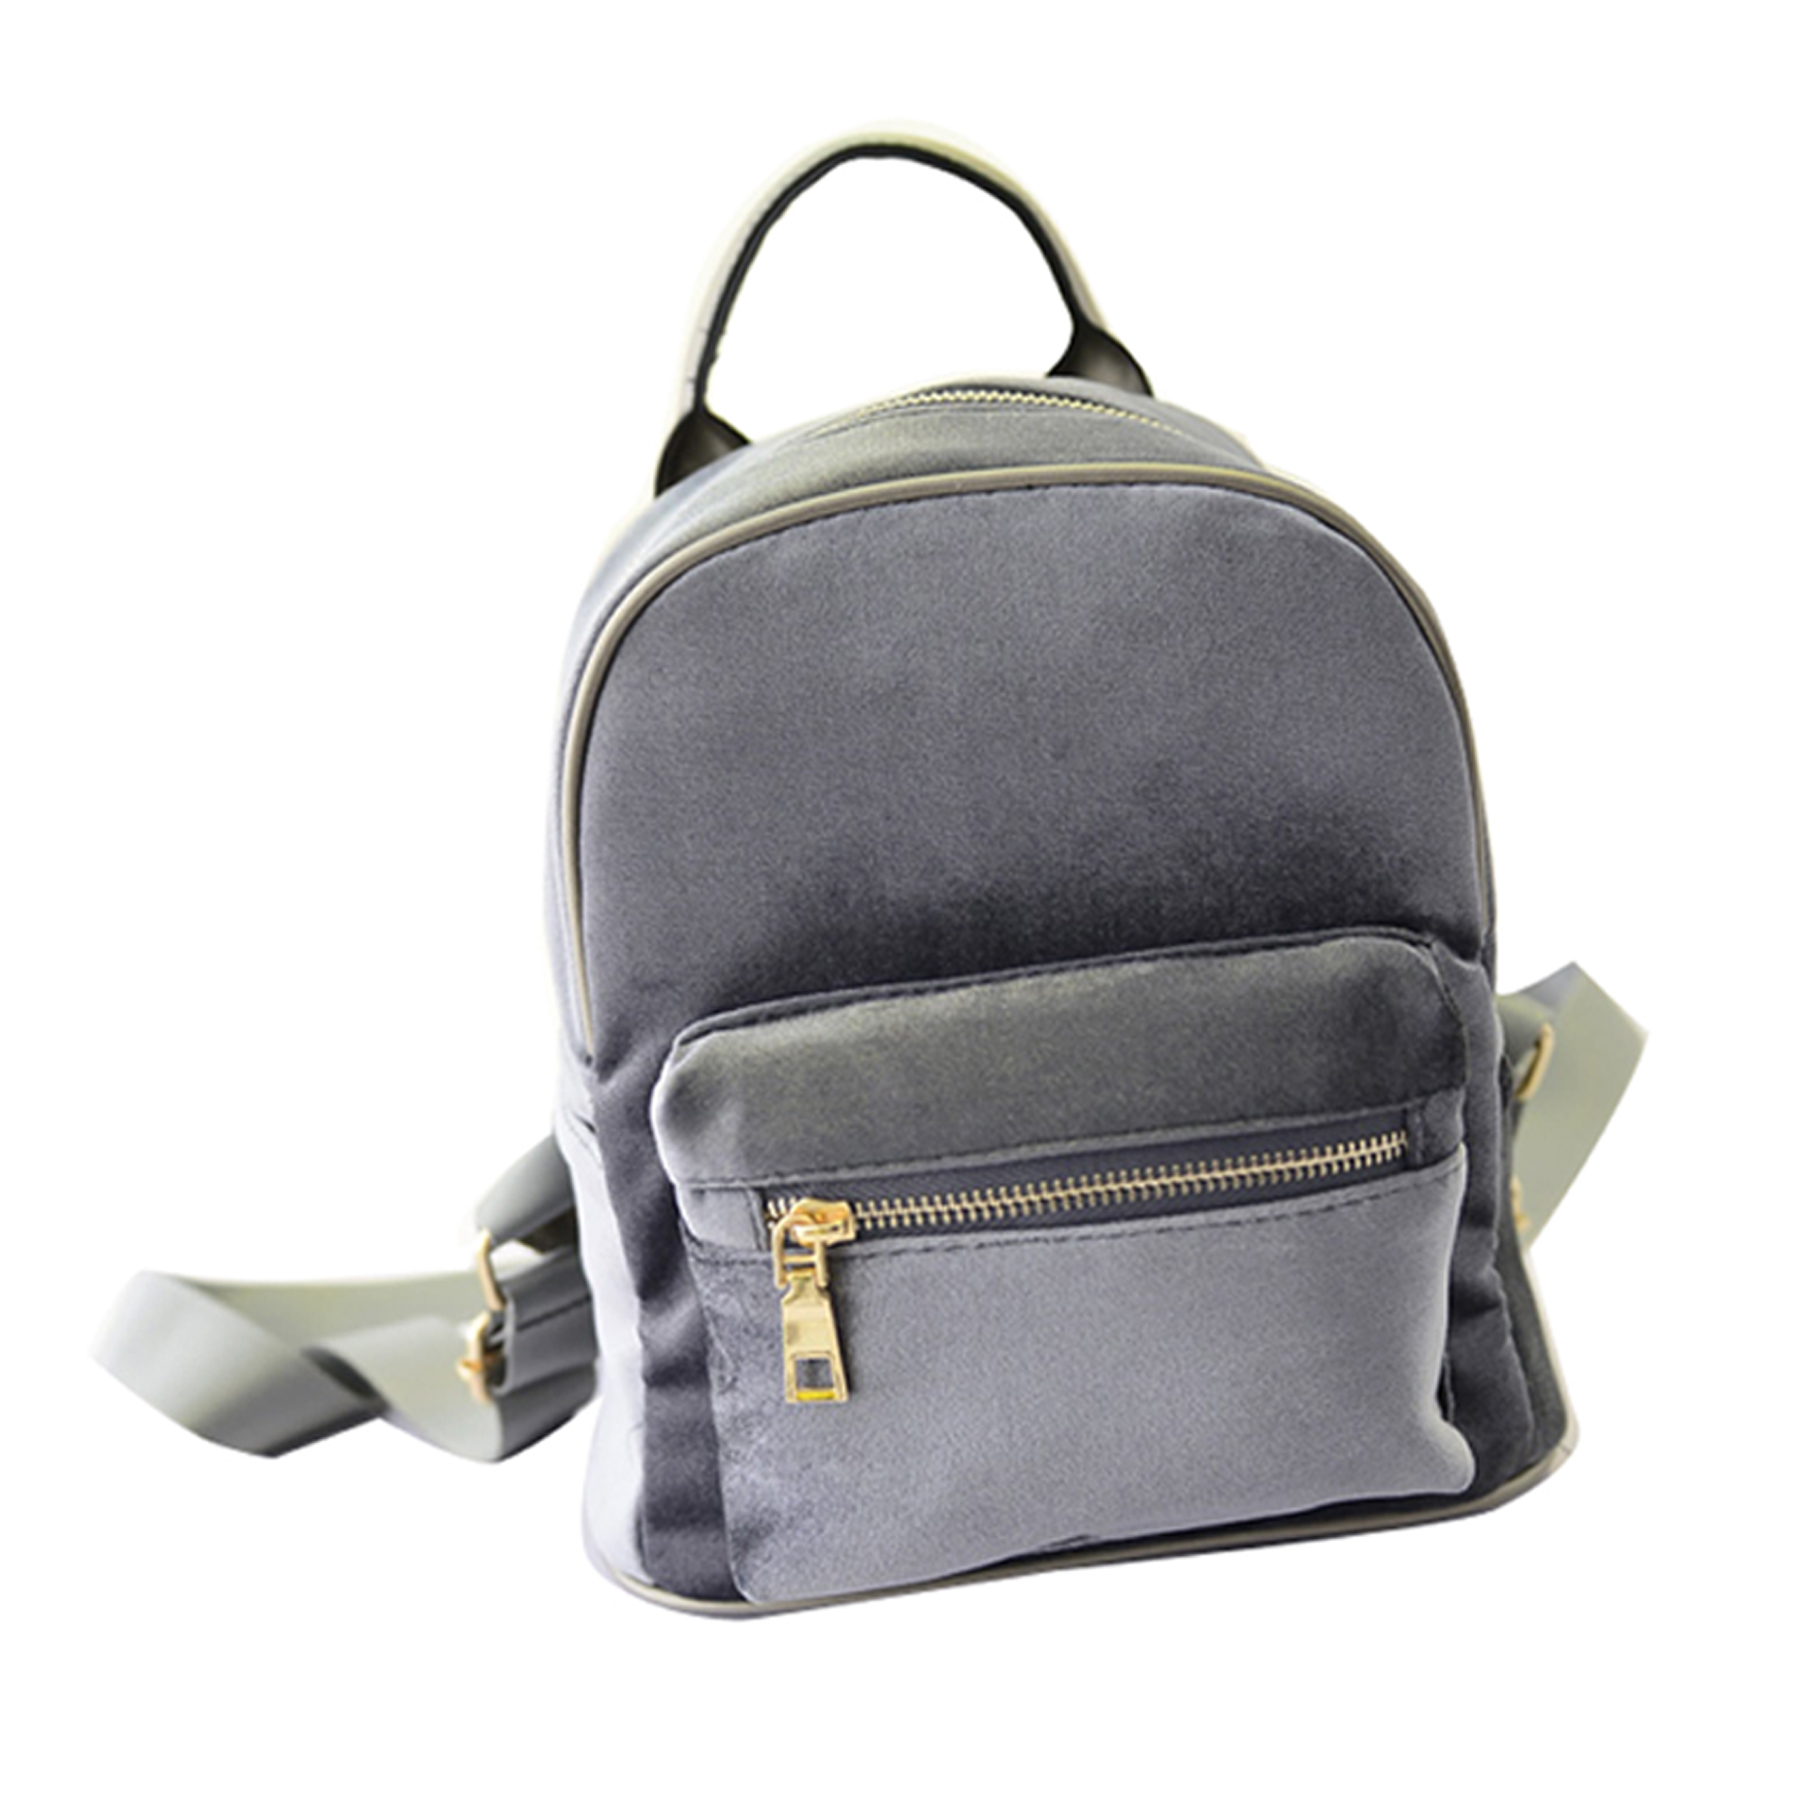 Women Small Backpack Student Fishion Mini Velvet Zipper bag High Quality Casual Small light Girl School bag Simple Style